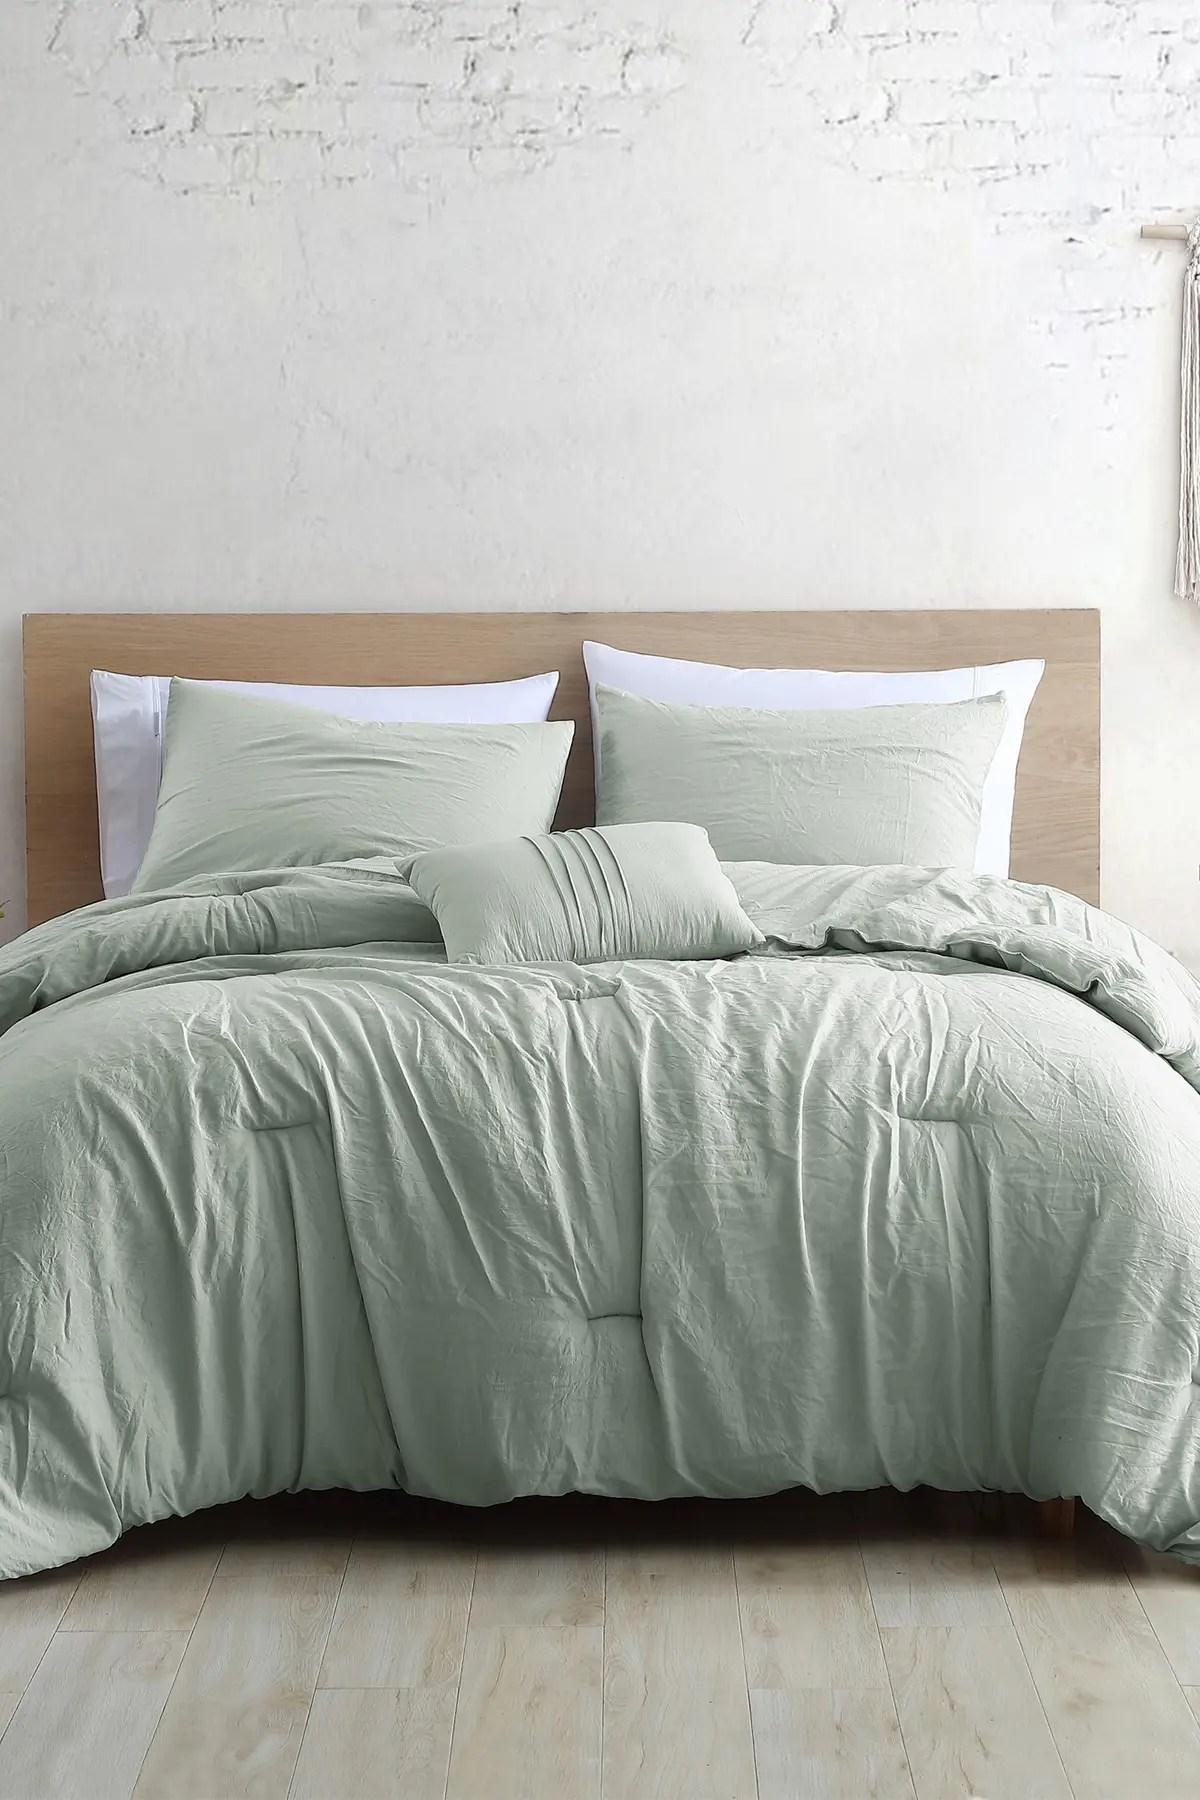 modern threads 4 piece garment washed comforter set beck spa queen nordstrom rack